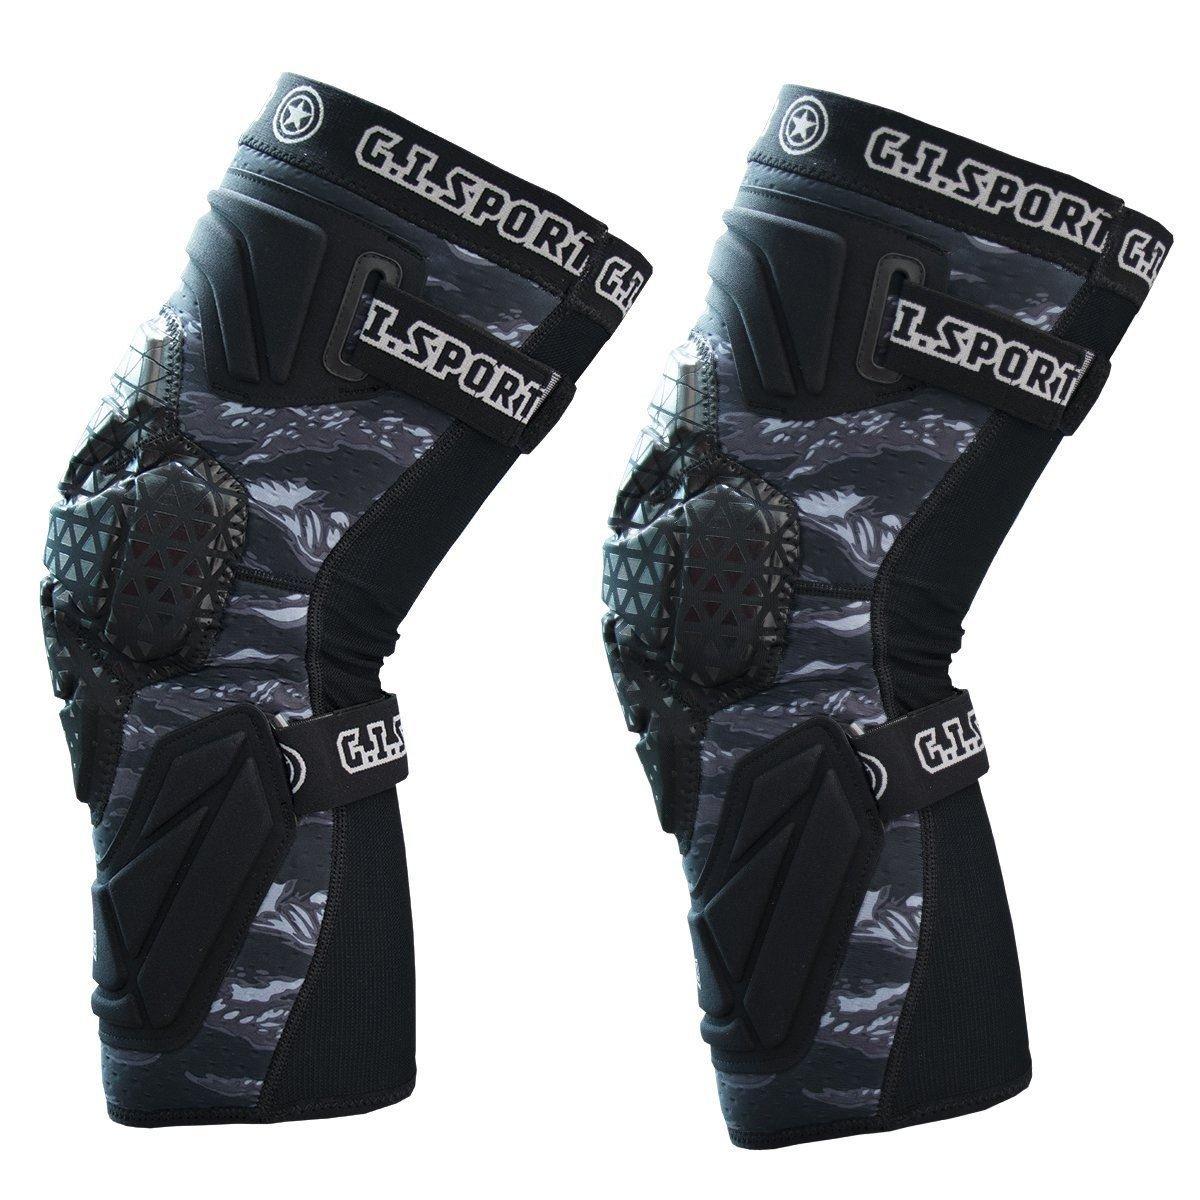 GI Sportz Race 2.0 Knee Pads Black (X-Large) by GI Sportz